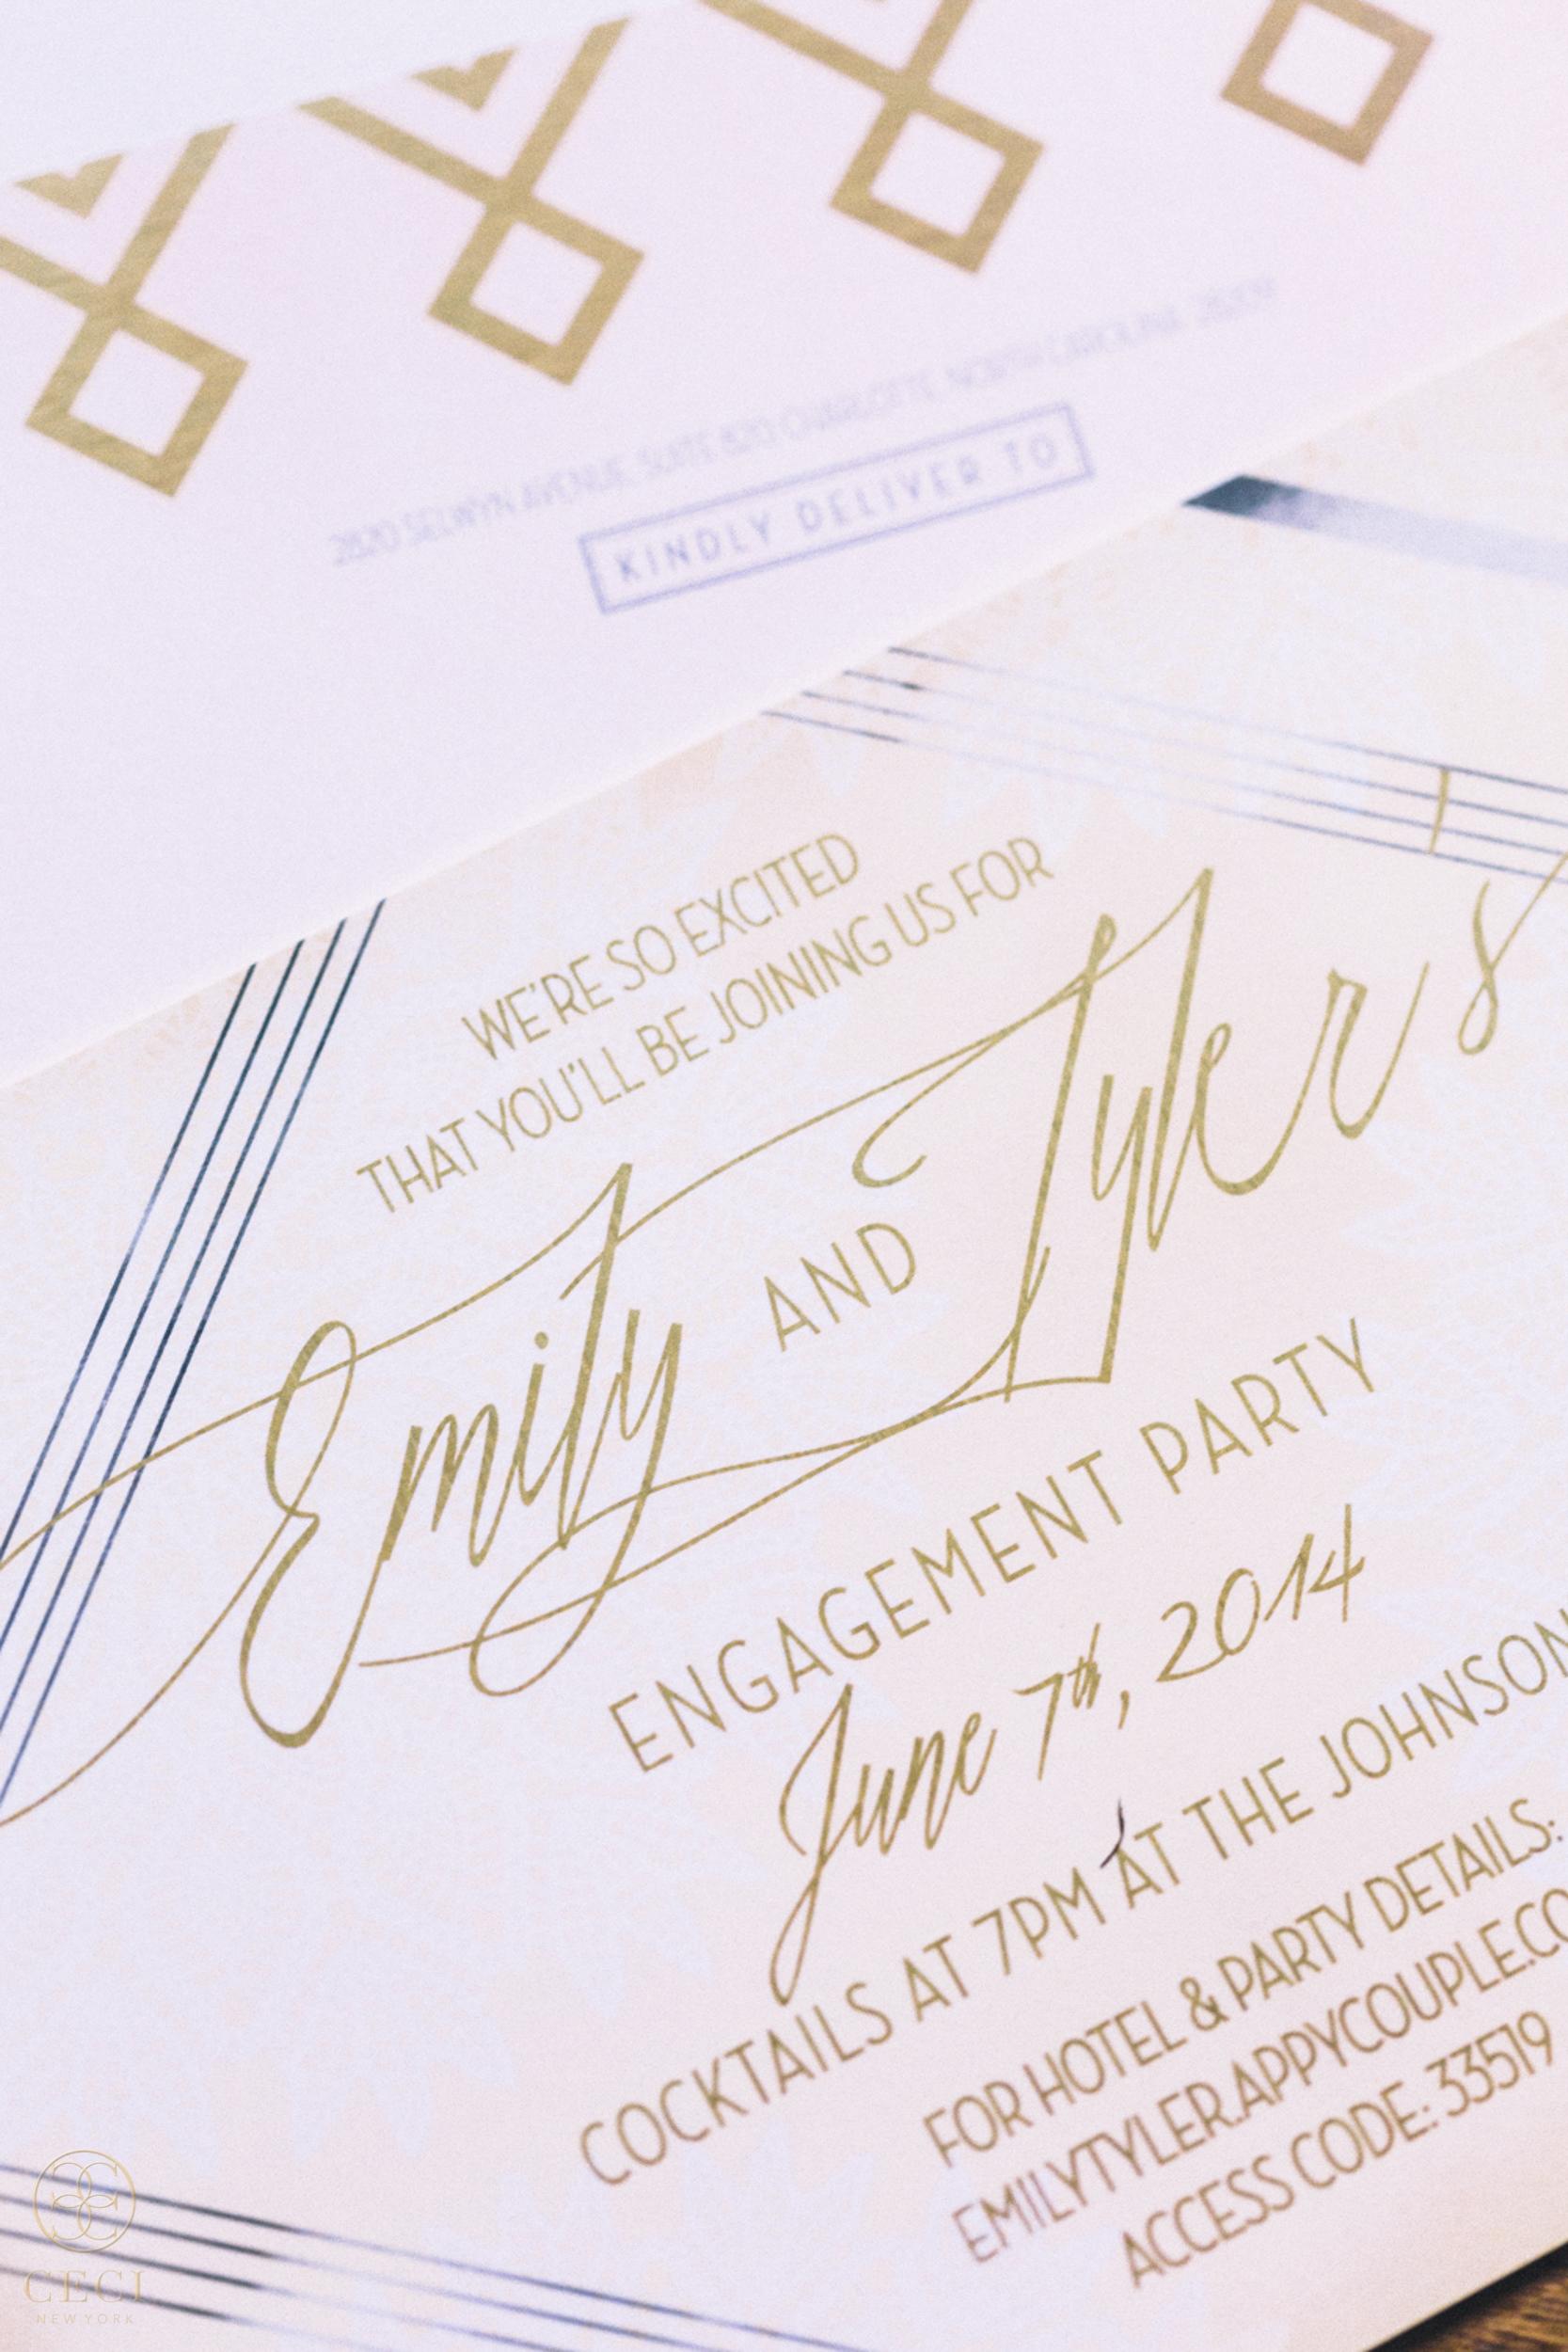 south_carolina_farm_wedding_rustic_chic_surprise_secret_luxe_wedding_bachelorette_emily_maynard_real_weddings_wedding_invitation_modern_viewfinder_3D_-1.jpg